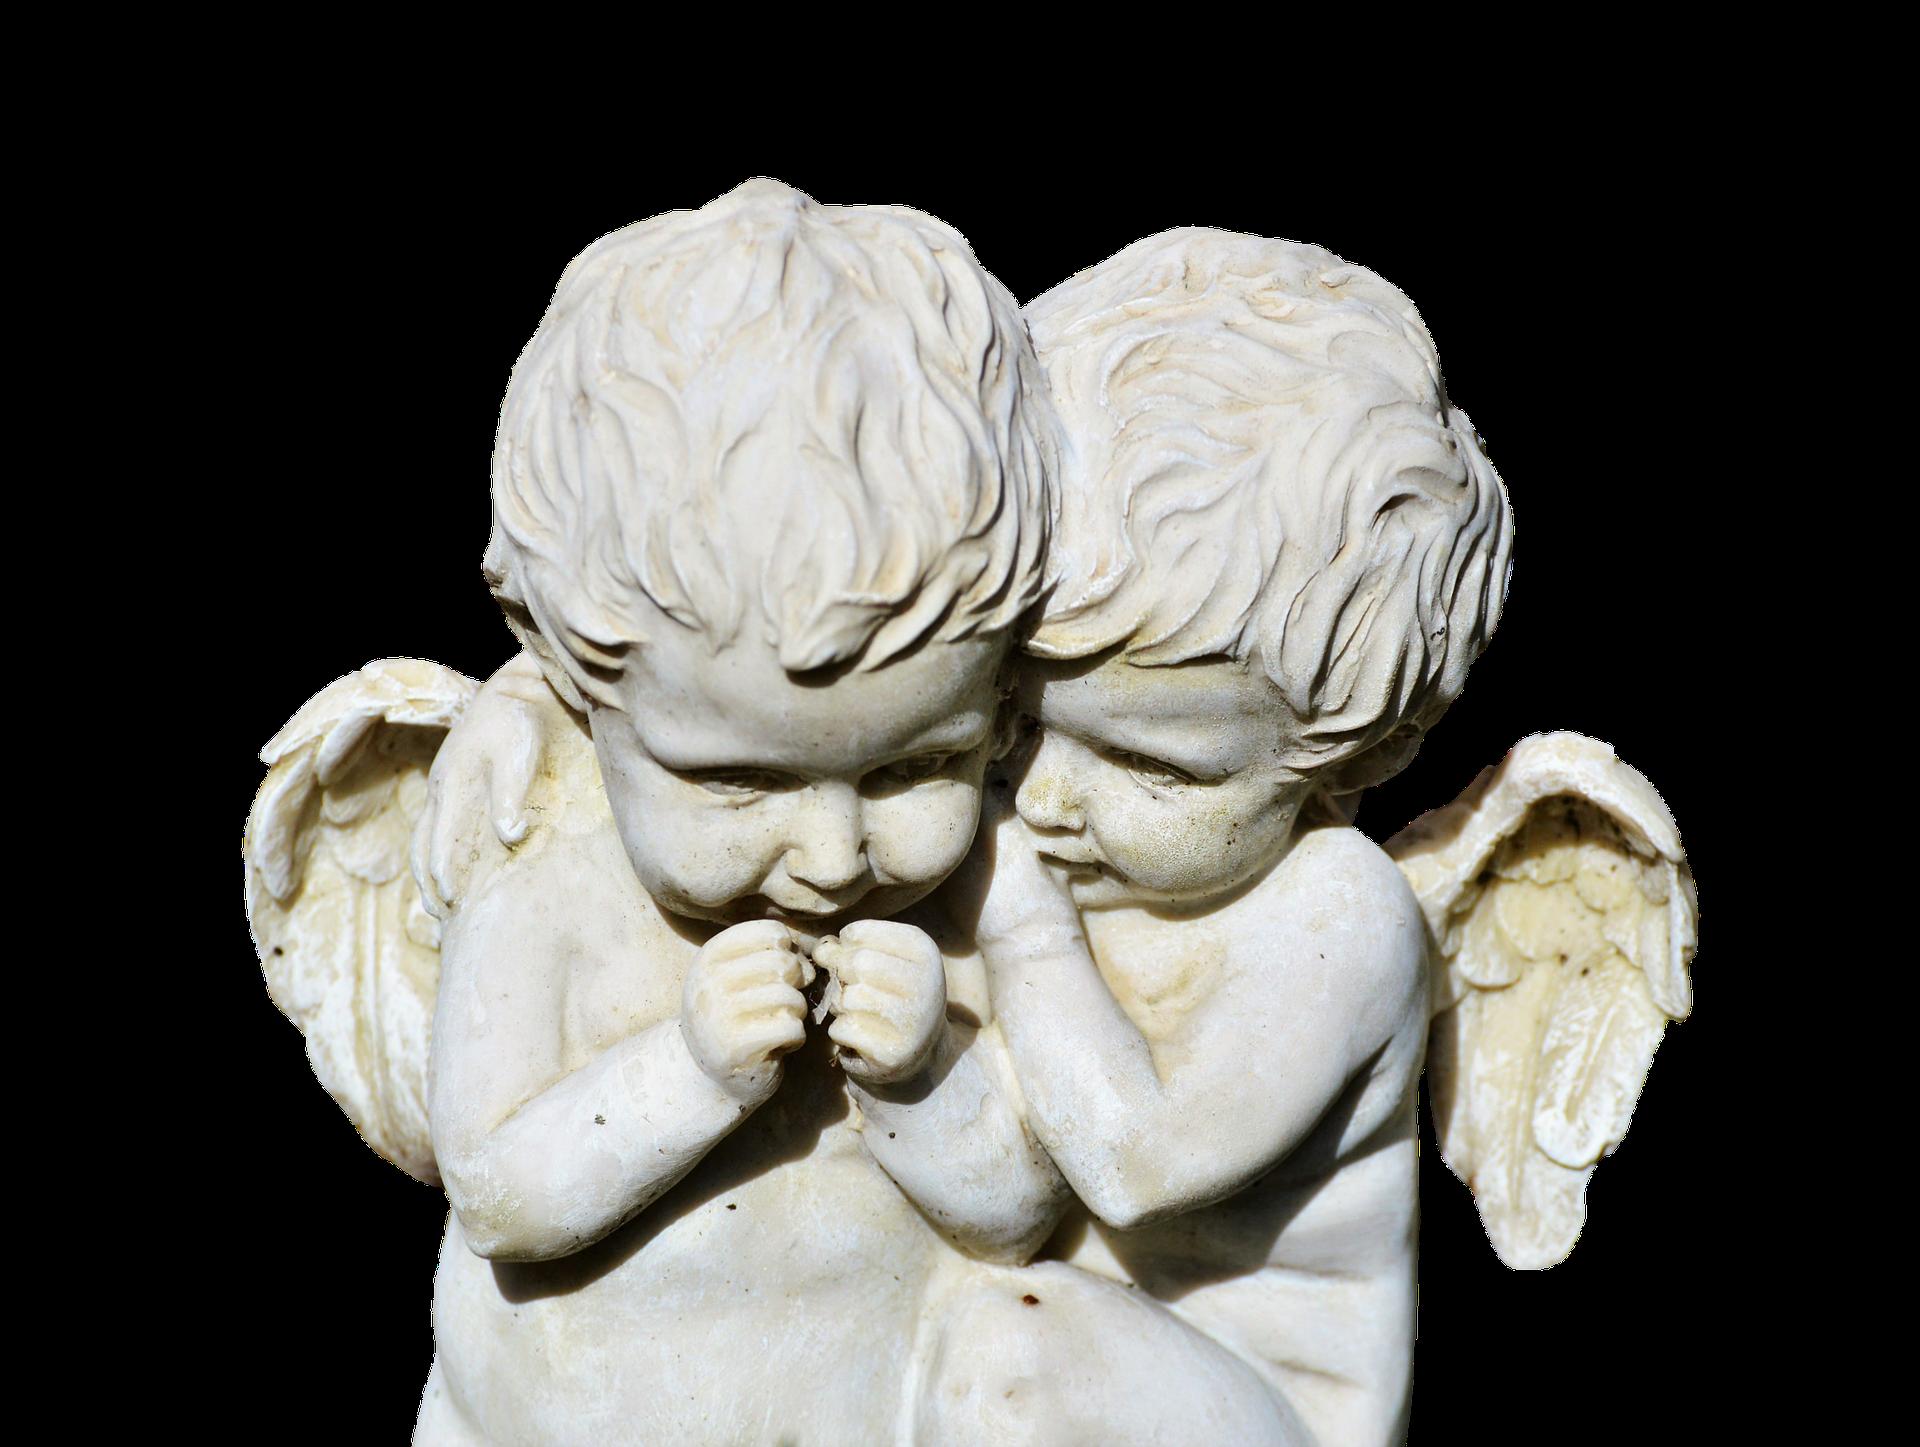 angel-2851605_1920.png